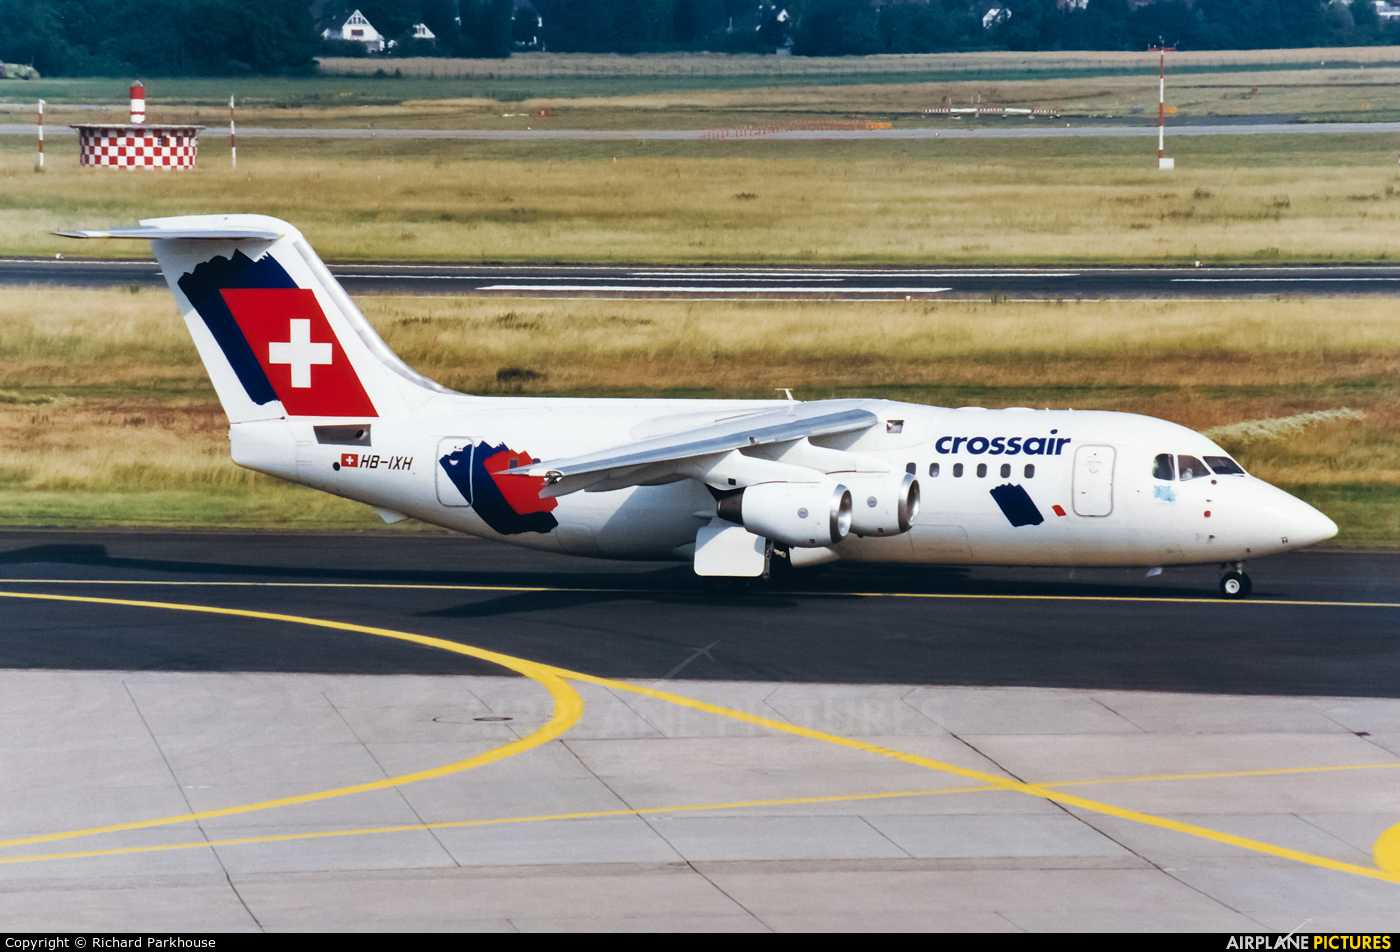 Crossair HB-IXH aircraft at Düsseldorf